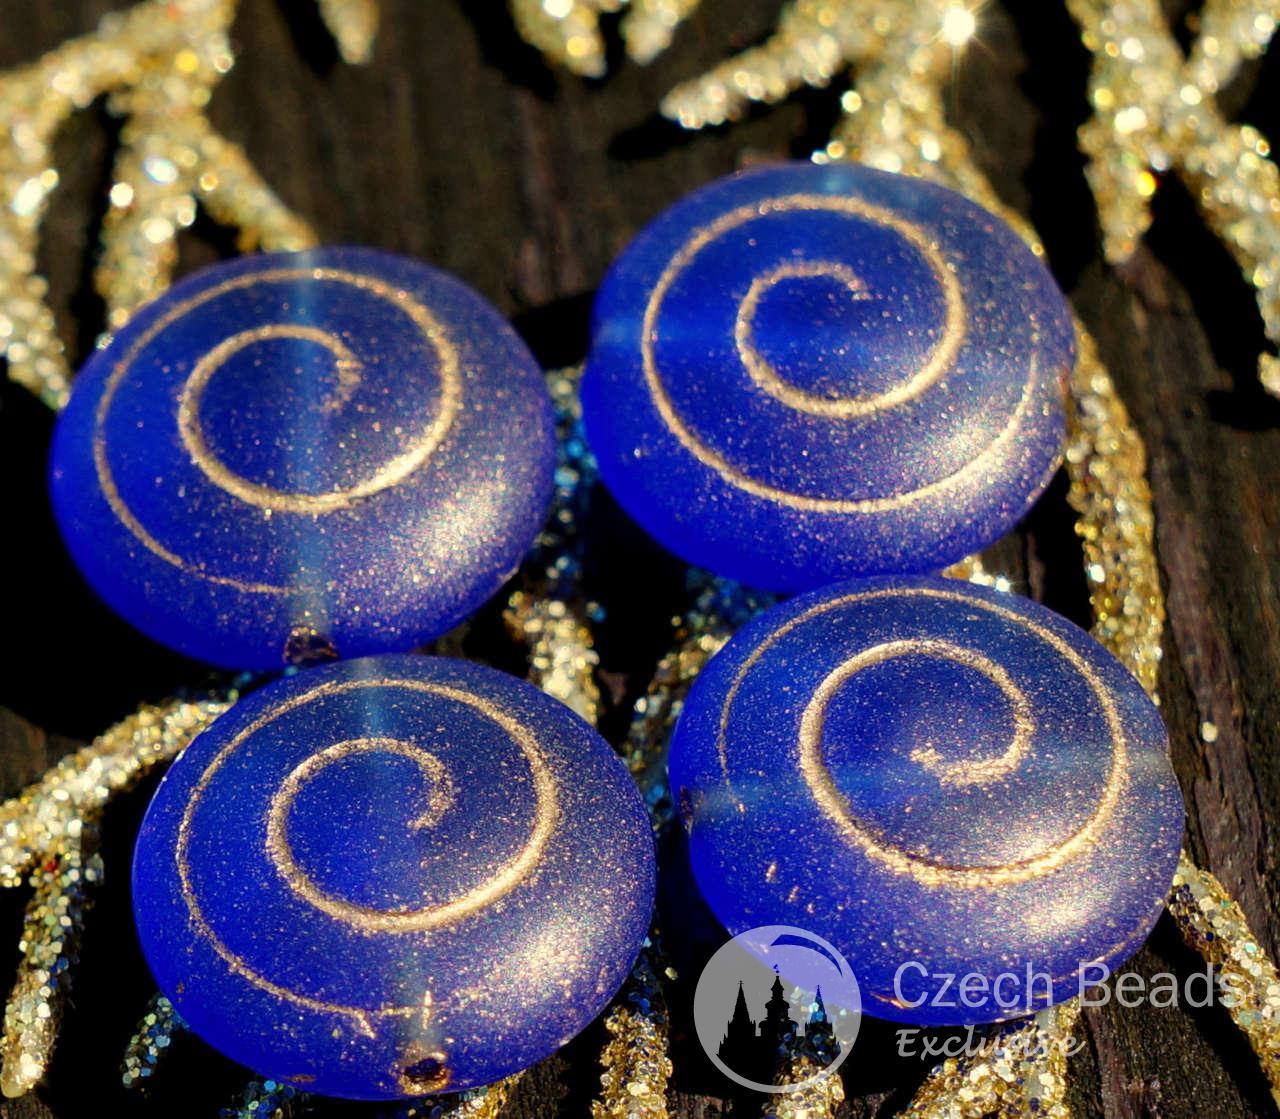 Blu opaco Oro Spirale di Perle di Vetro ceco Nautilus Perle di Vetro Ammonita Cordone di Ammonite Fossile Cordone di Conchiglia di Perle di Conchiglia Nautilus 13mm 4pc per $ 1.84 da Czech Beads Exclusive